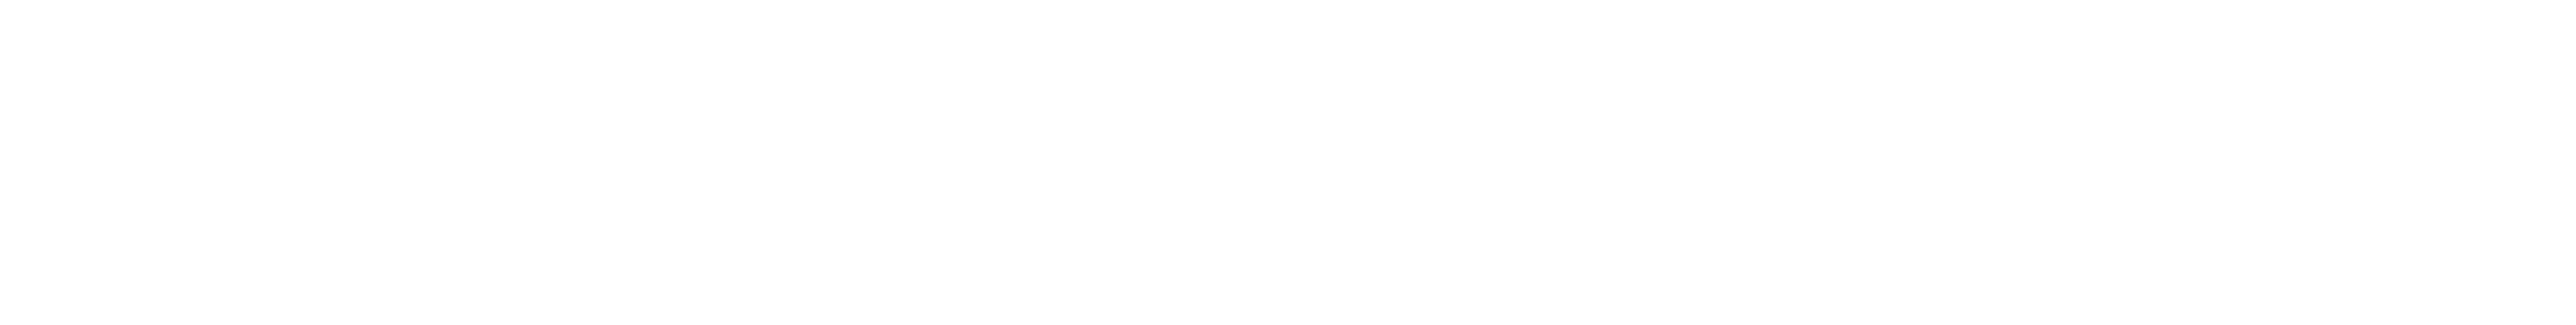 Dot Esports Espanol